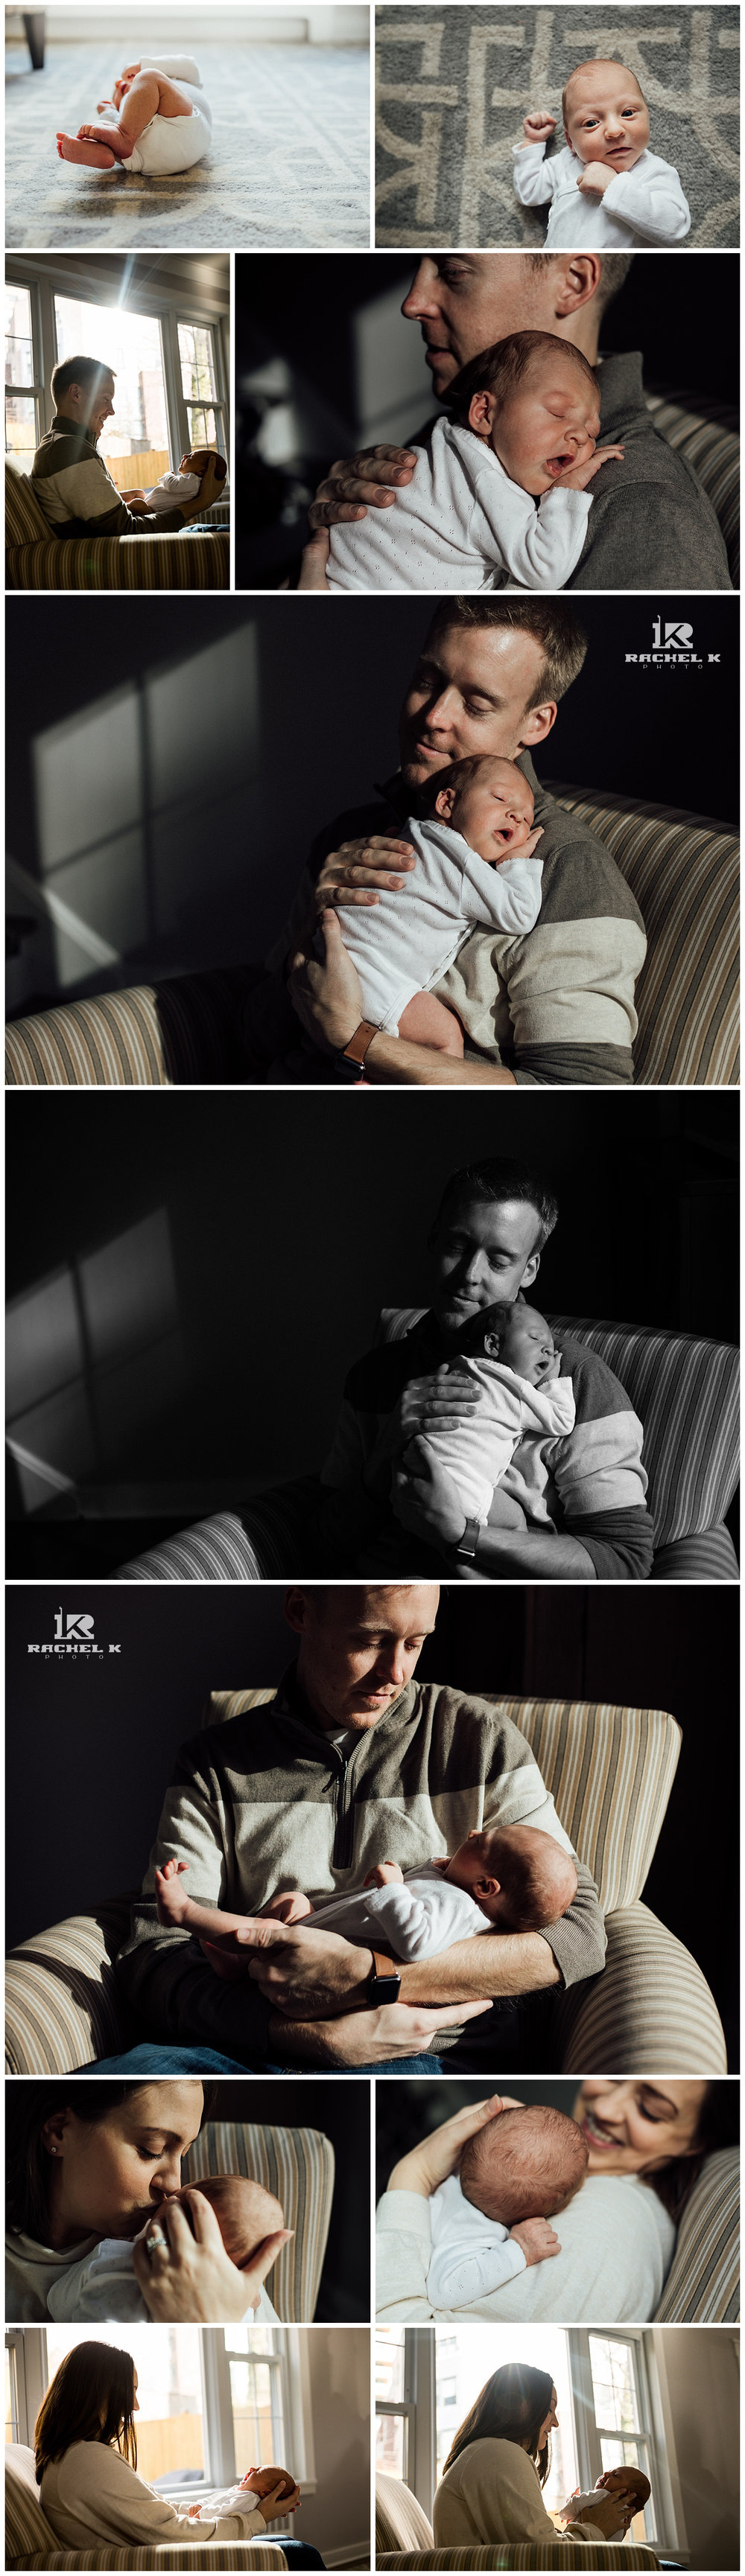 Fairfax newborn lifestyle session by Rachel K Photo